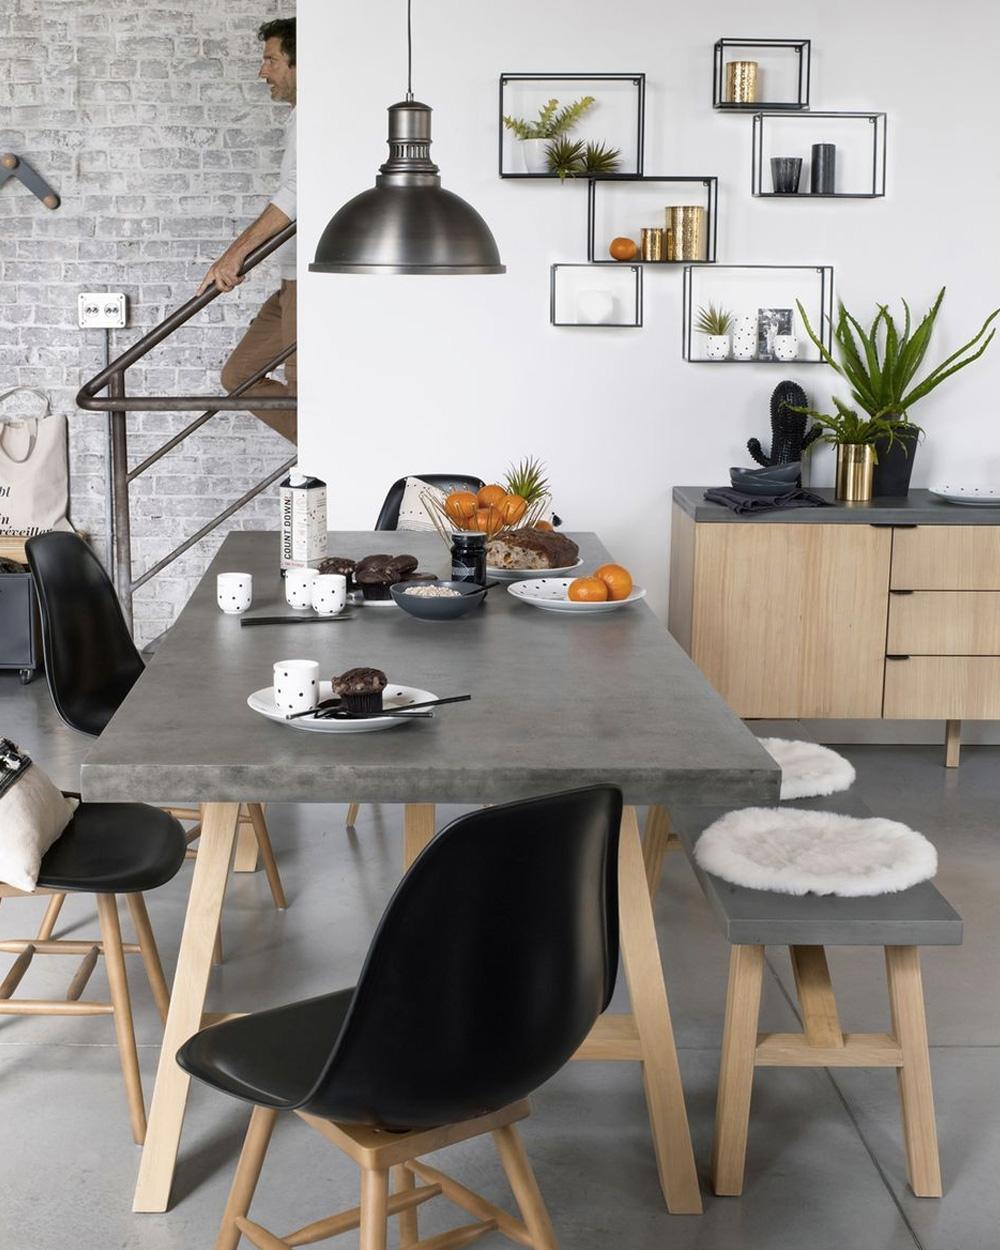 comment utiliser le b ton dans sa d co shake my blog. Black Bedroom Furniture Sets. Home Design Ideas